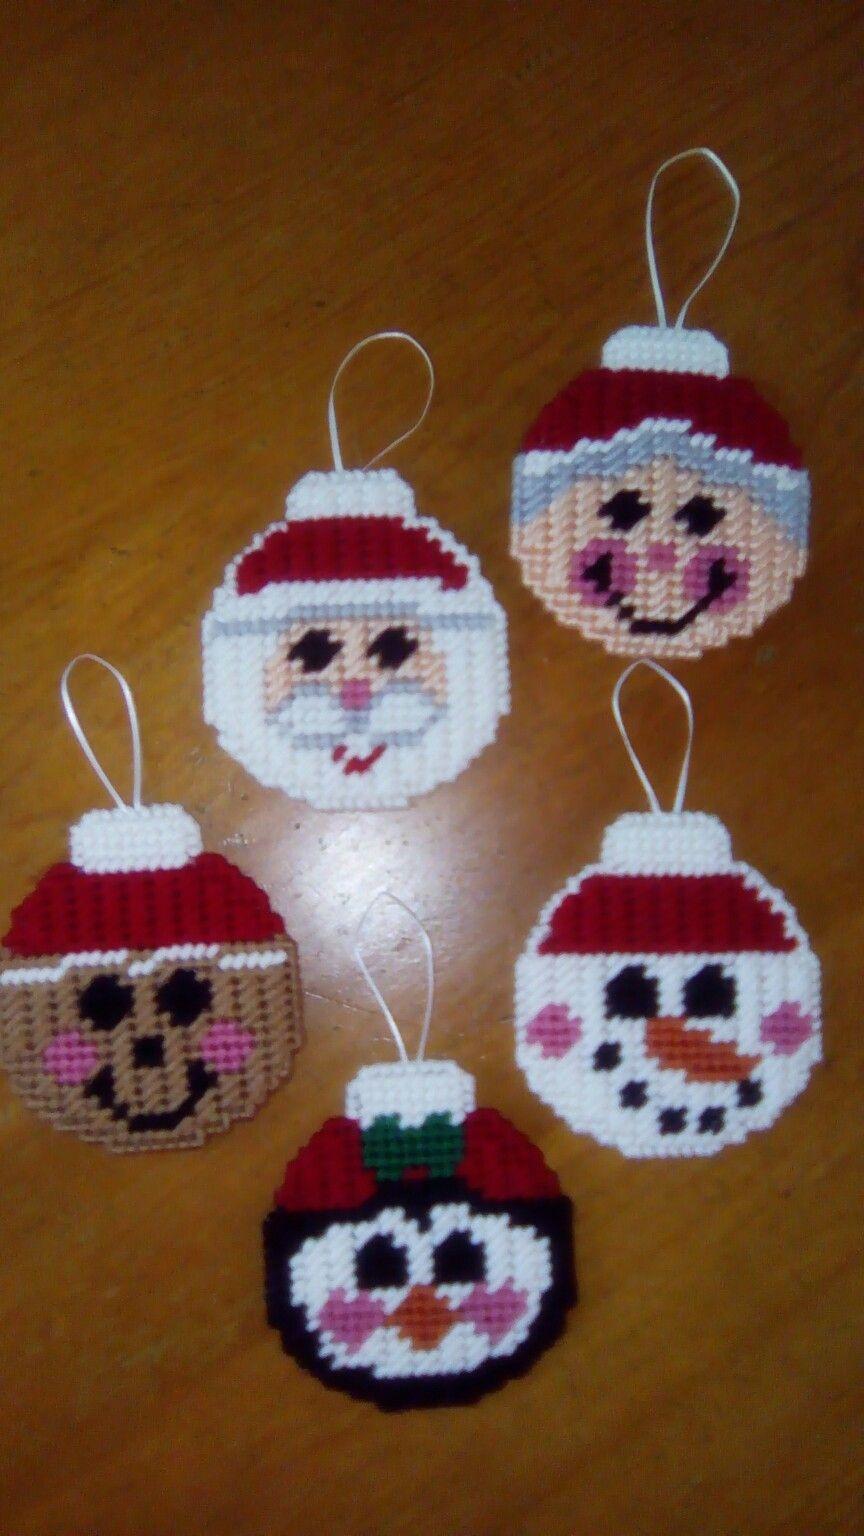 Pinterest - Free Printable Plastic Canvas Christmas Patterns